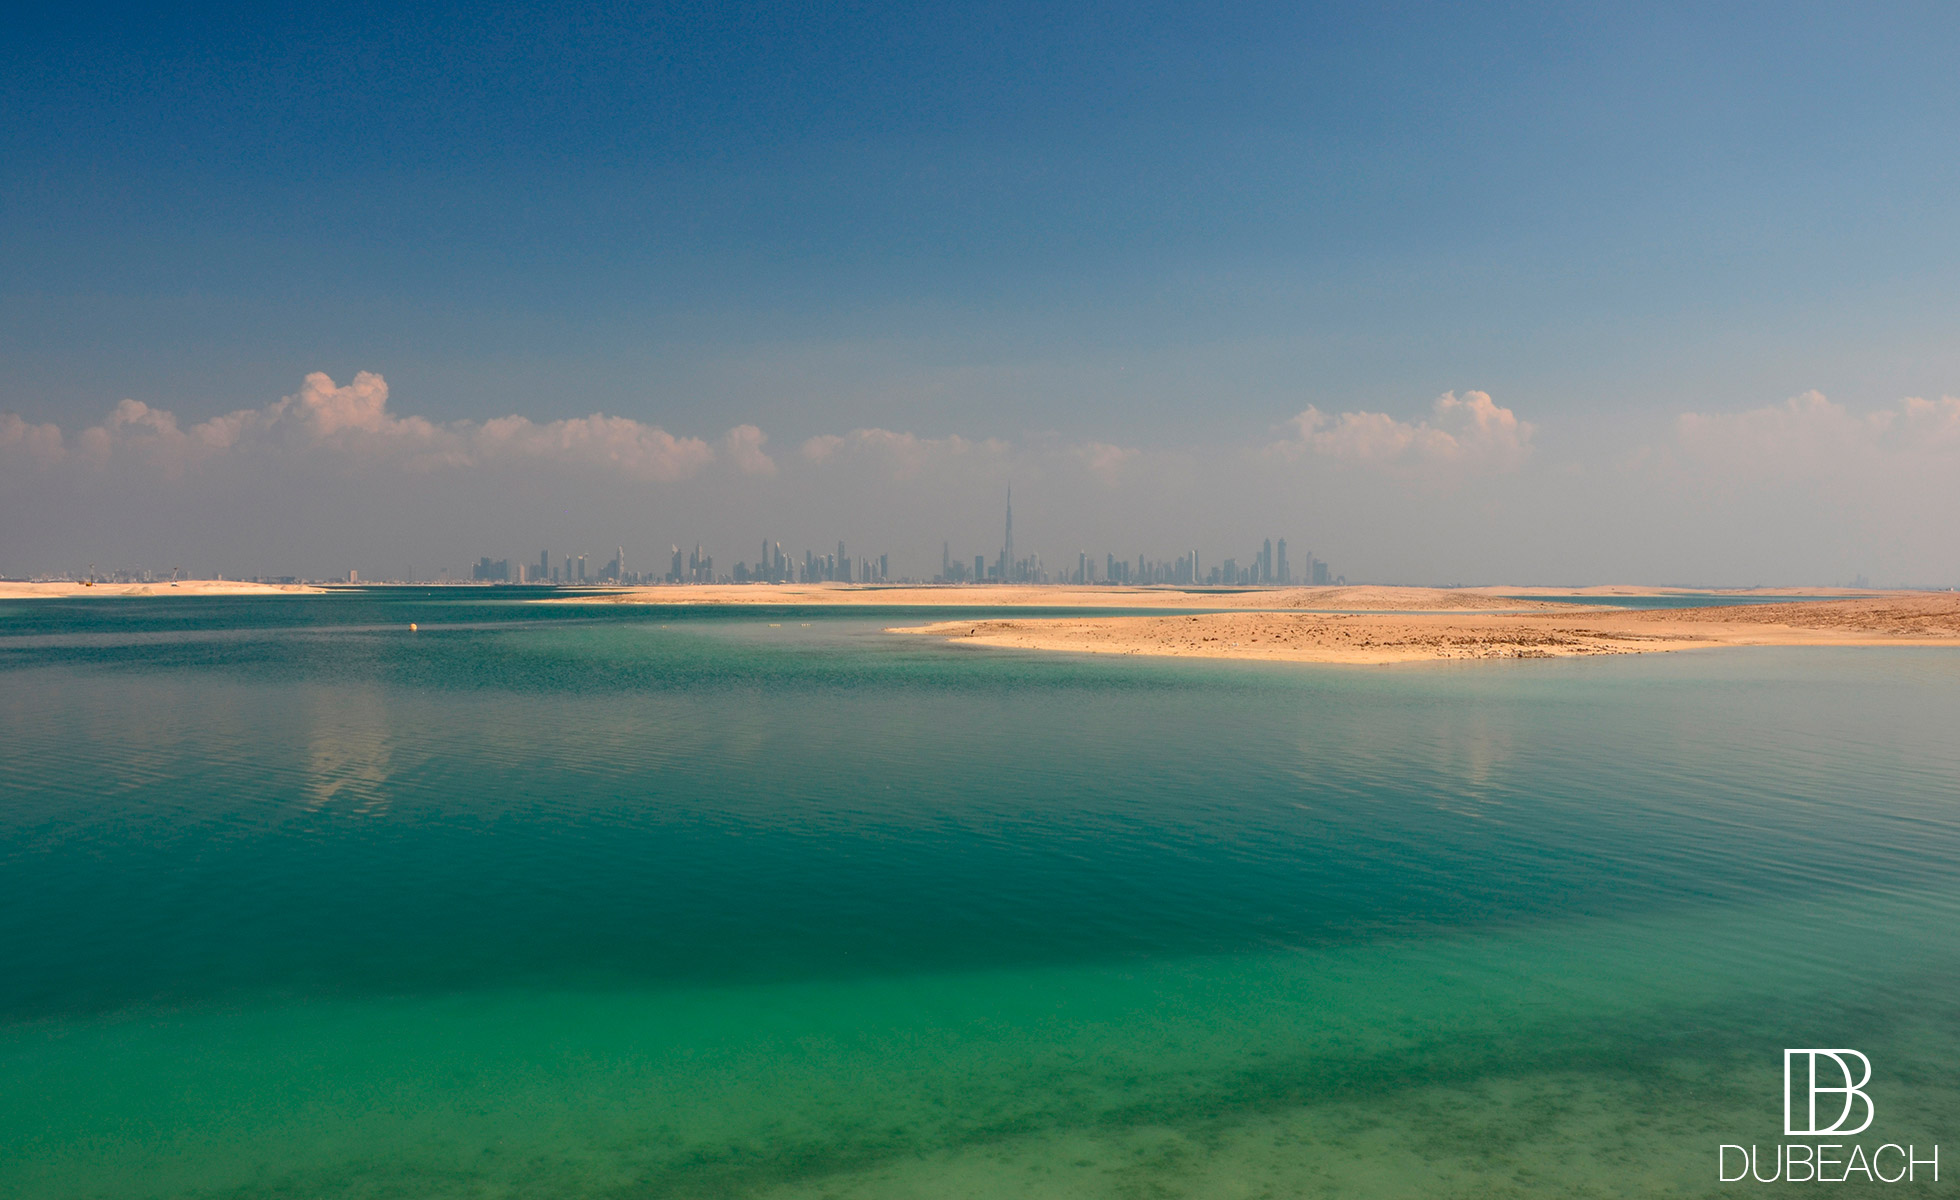 The island lebanon island the world dubai location gumiabroncs Image collections